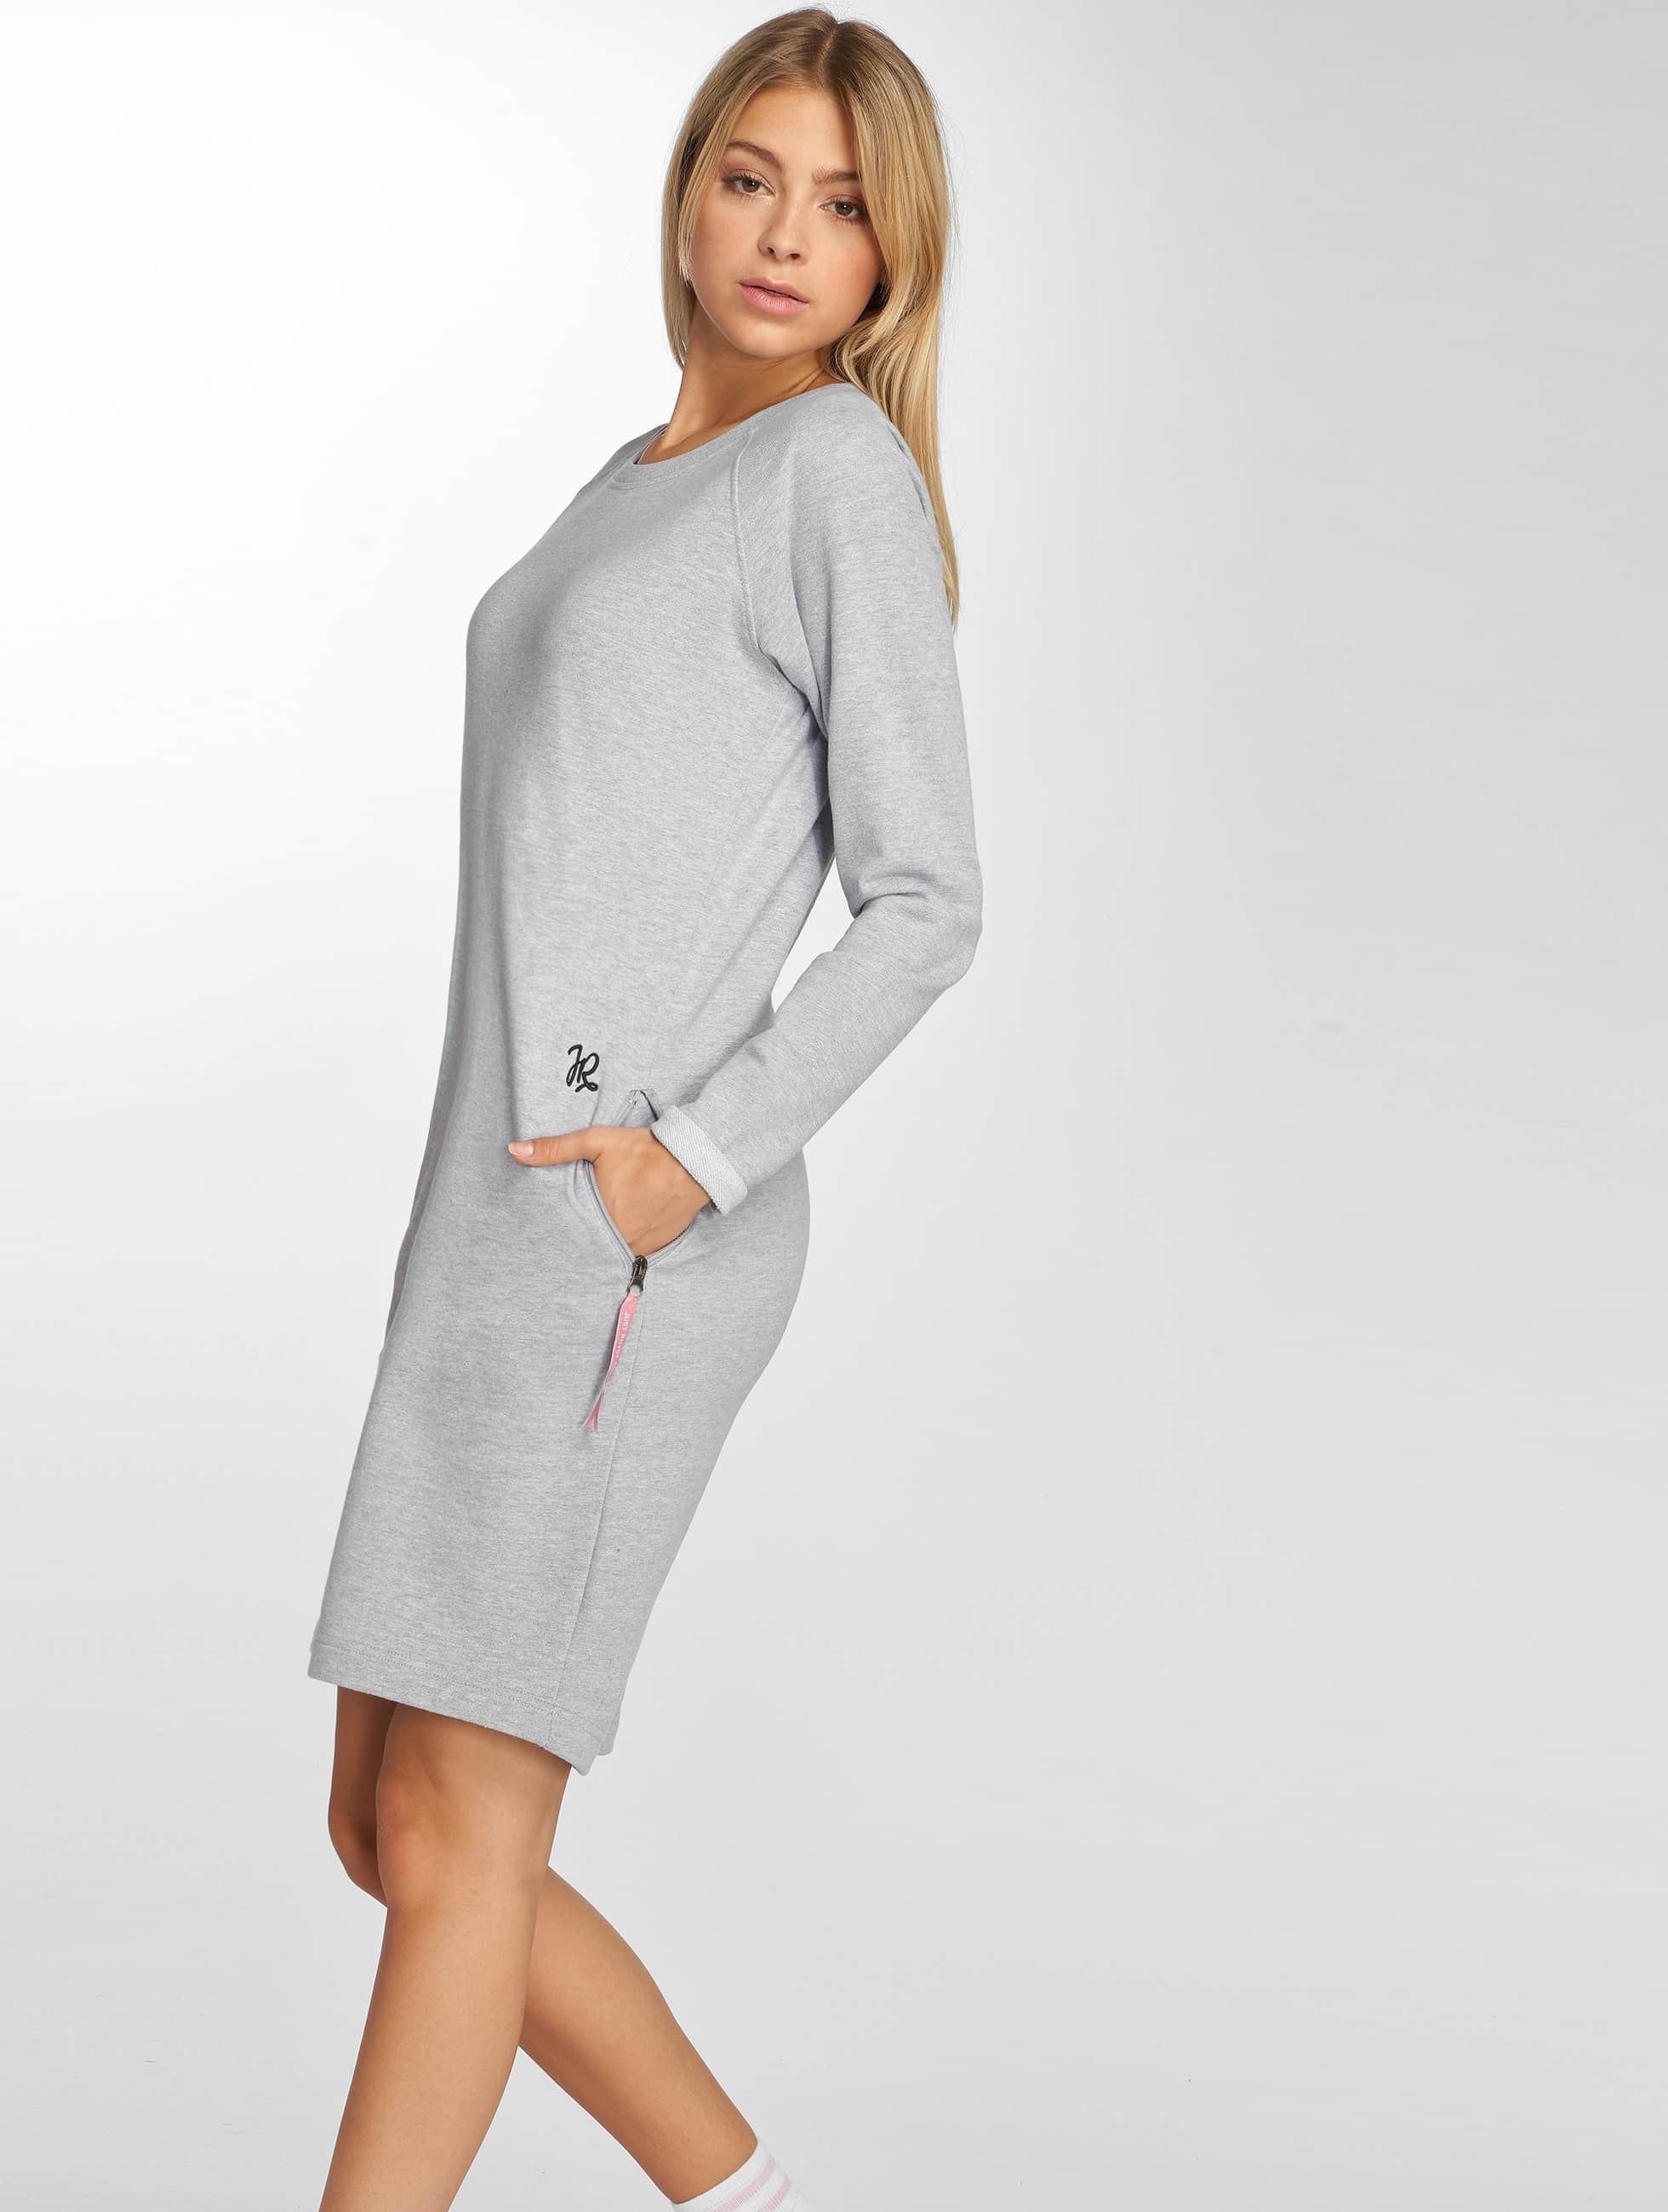 Just Rhyse / Dress Santadi in grey S